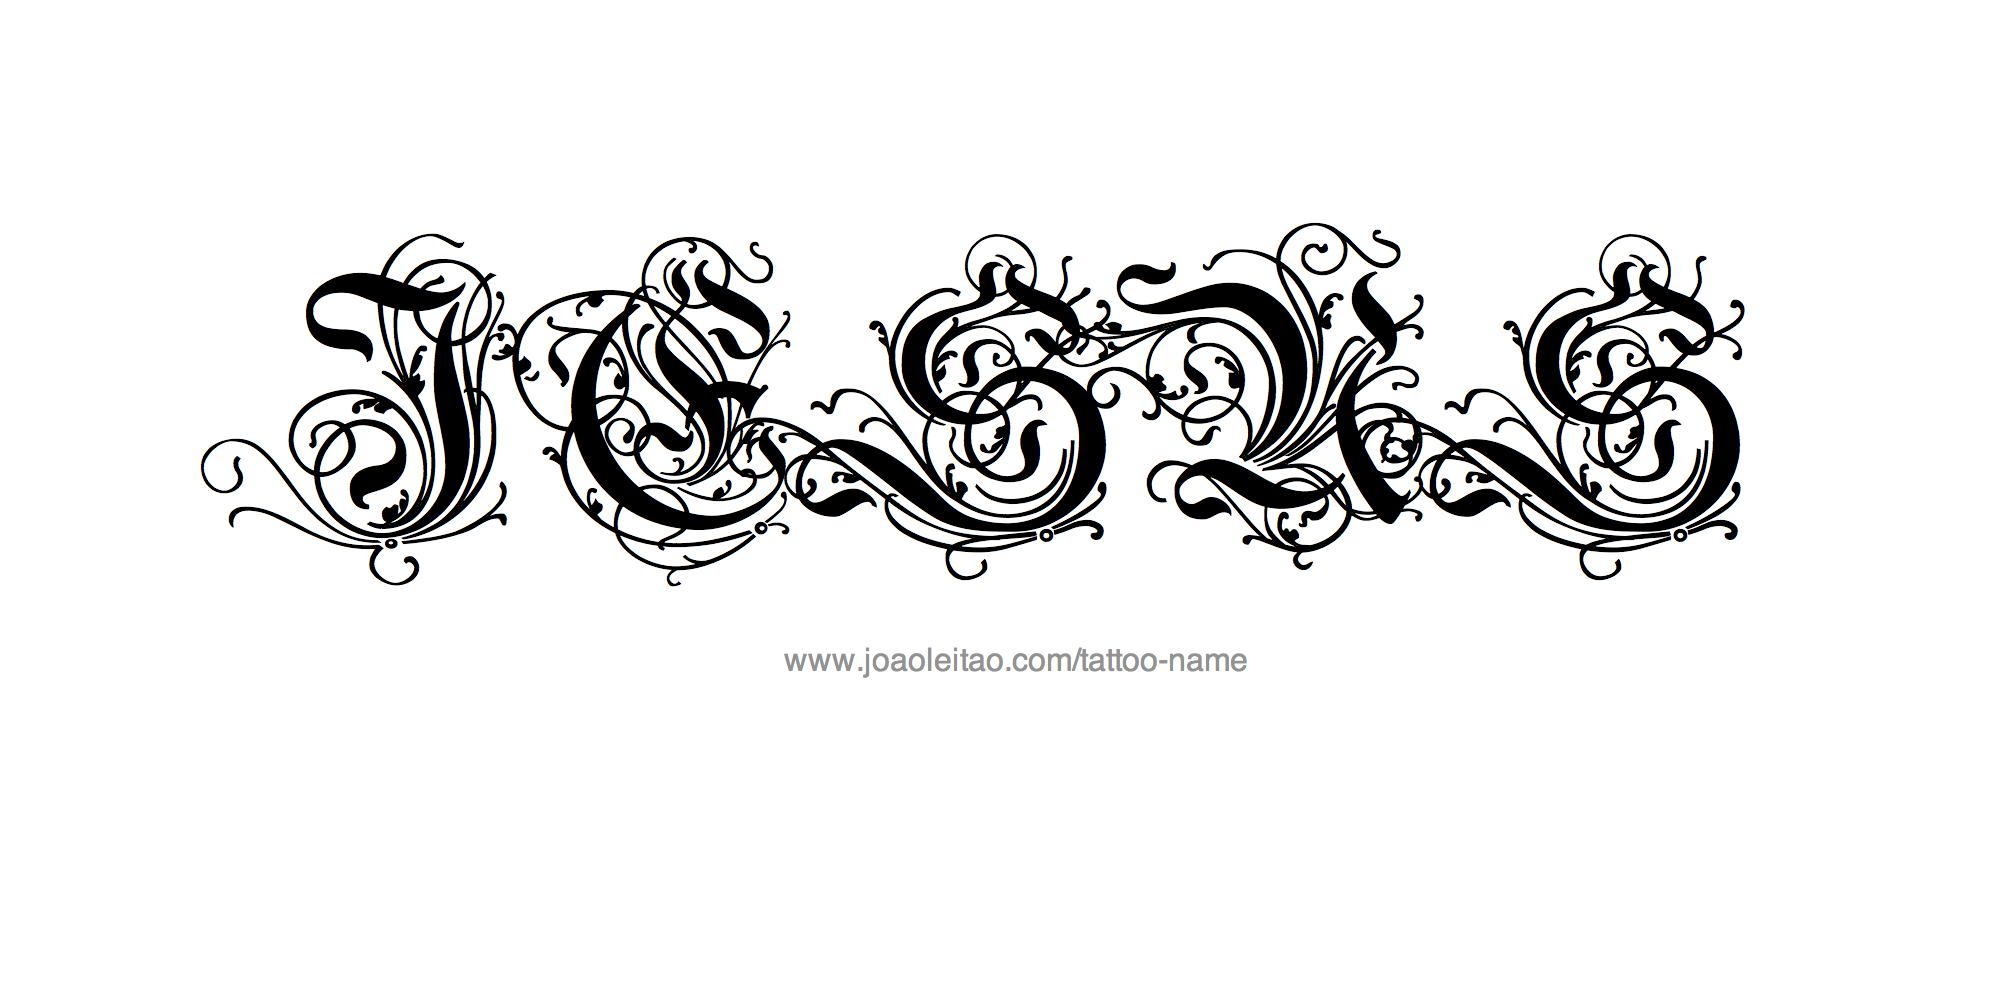 Jesus name tattoo designs for Name tattoo maker